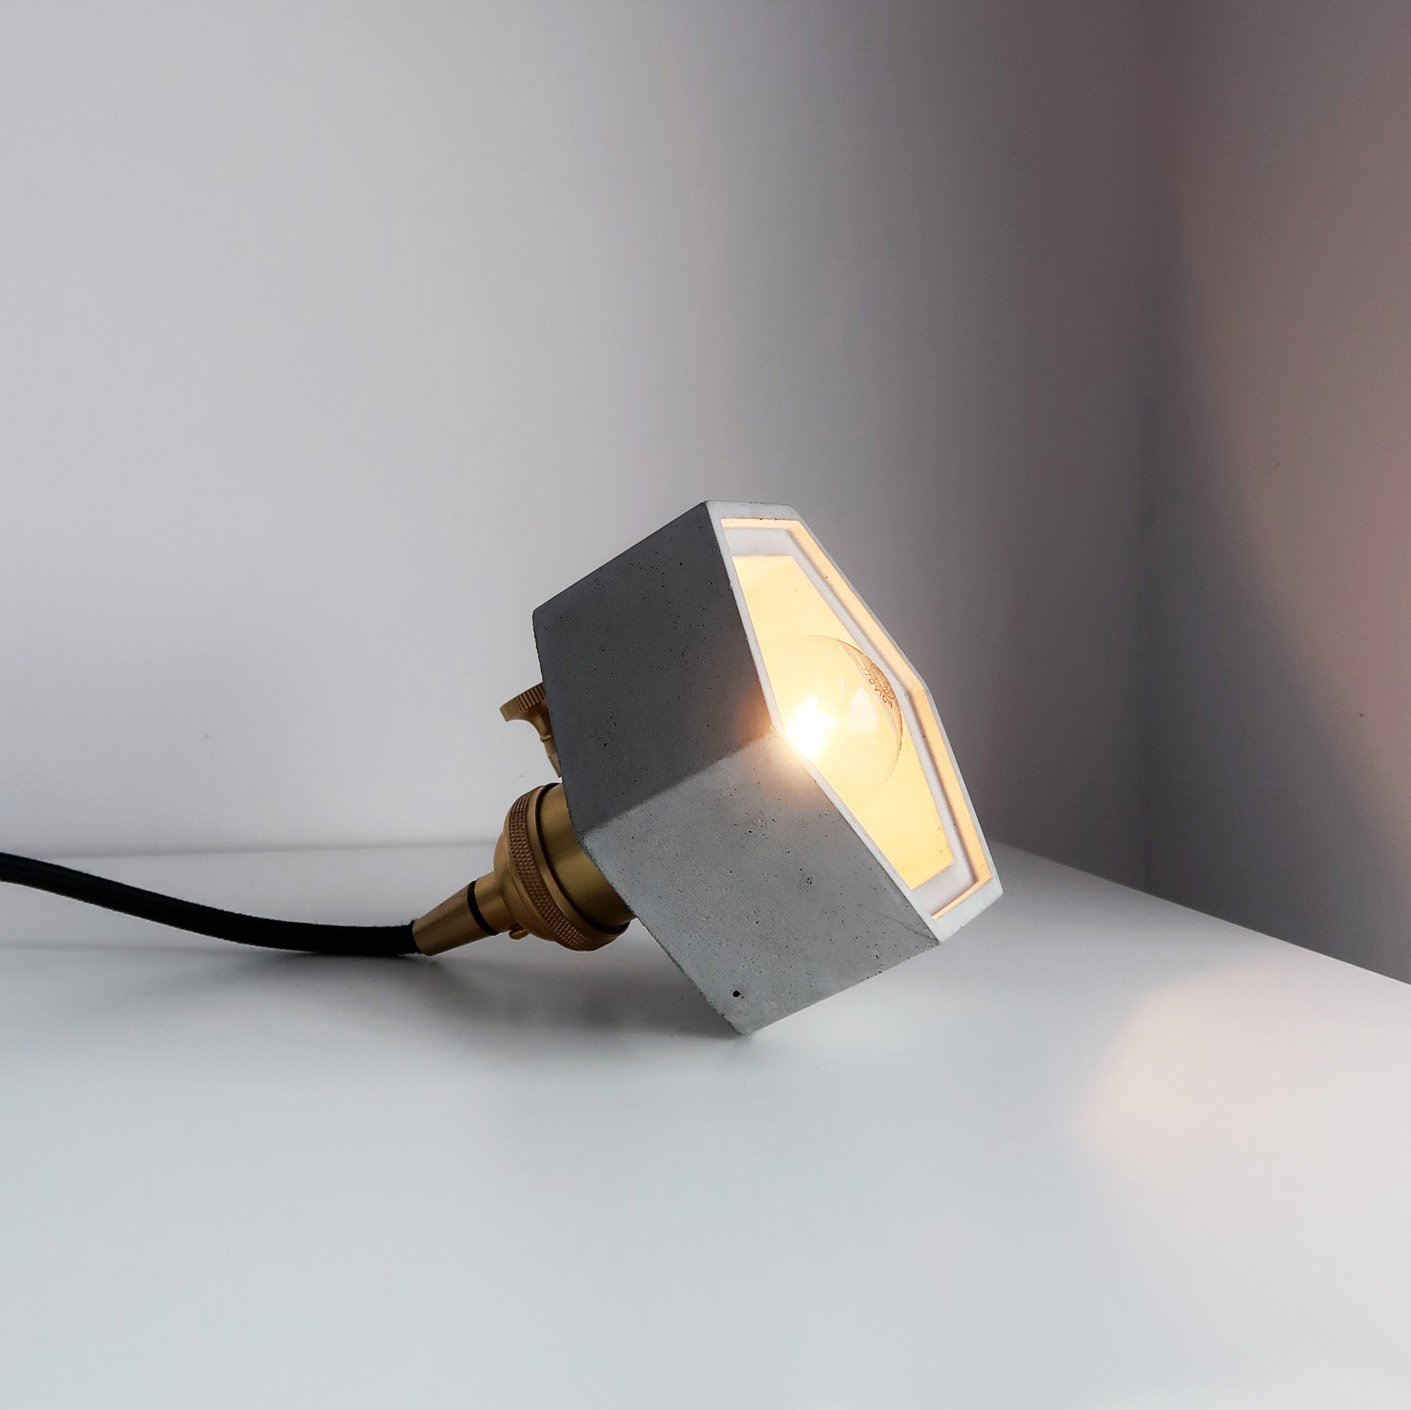 HALO 光圈黃銅六邊型斜角水泥夜燈 / Brass concrete lamp